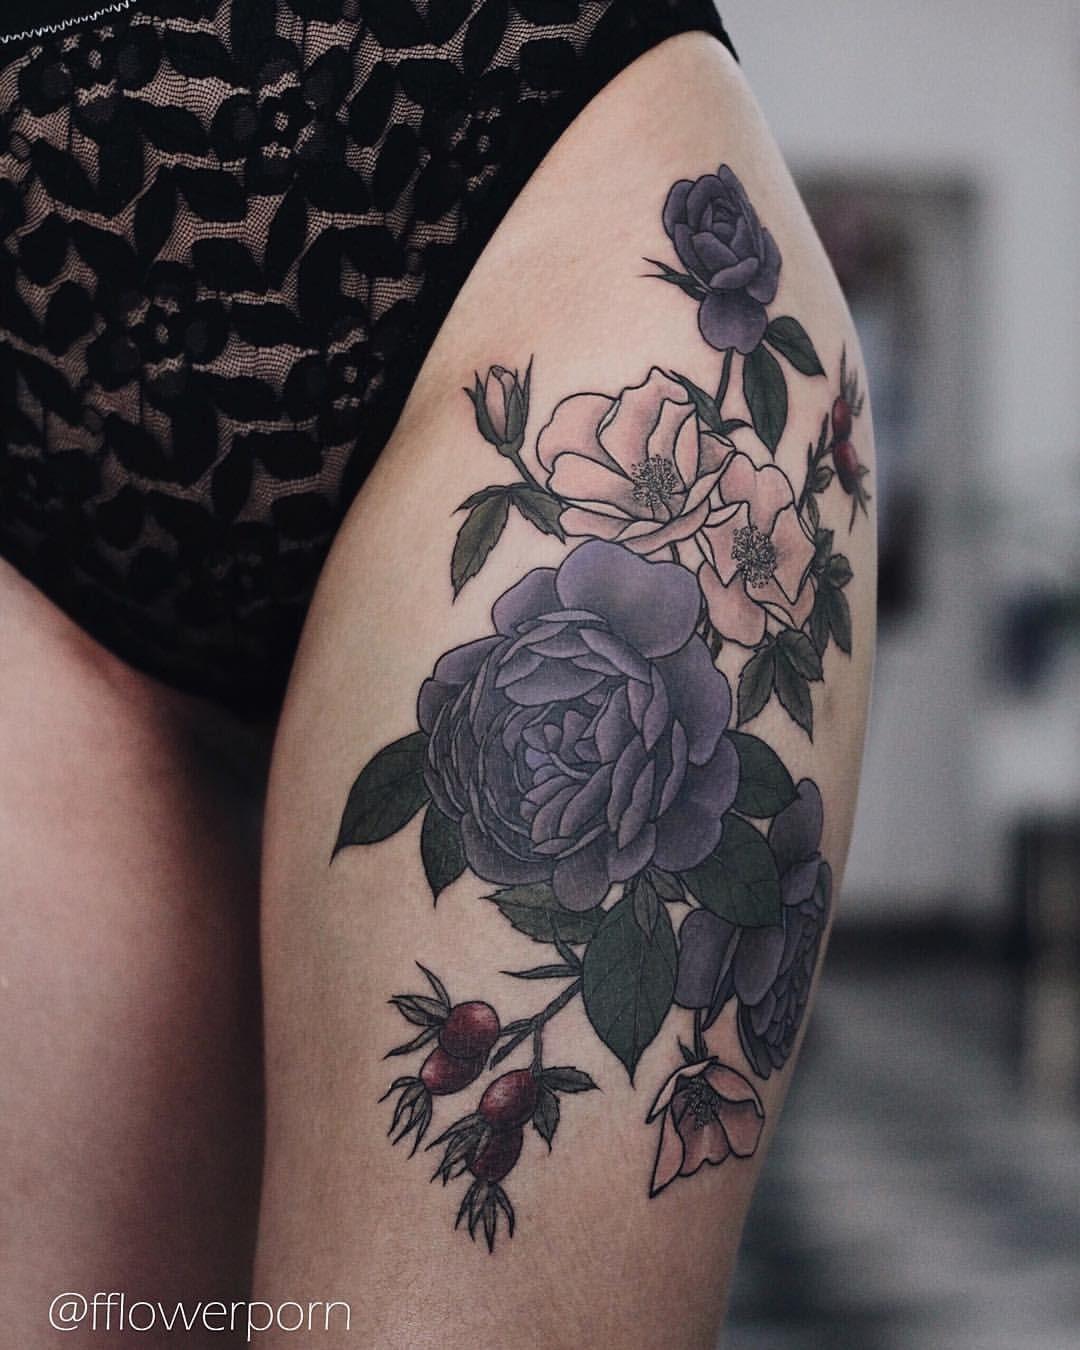 See this instagram photo by fflowerporn u likes tattoos